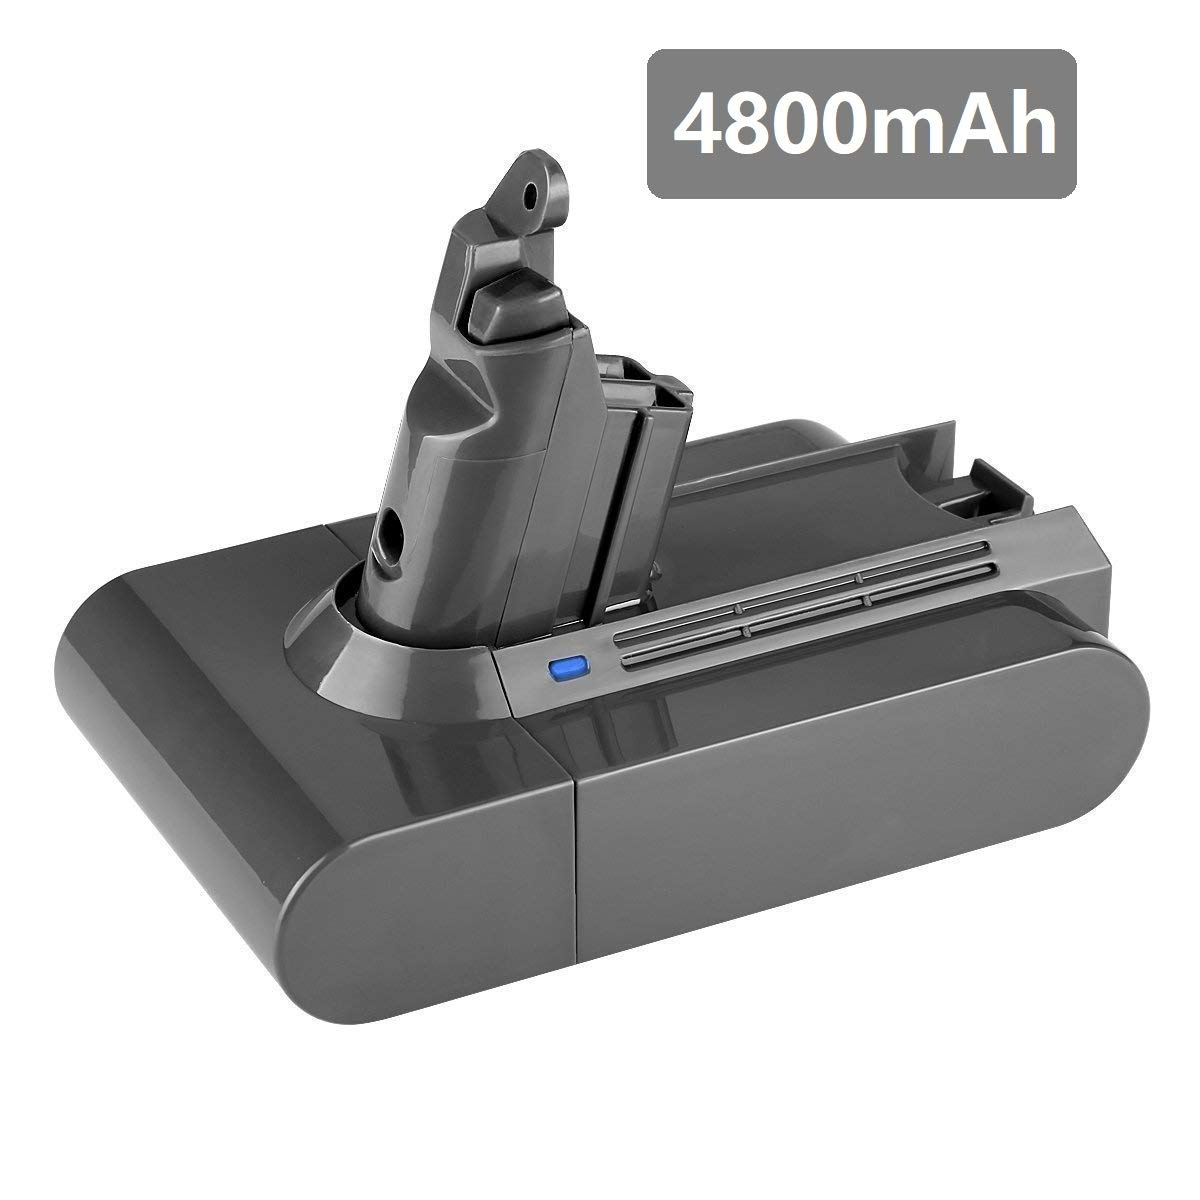 [Upgraded 4800mAh] 21.6v Replacement for Dyson Battery V6 595 650 770 880 DC58 DC59 DC61 DC62Animal DC72 Series Li-ionHandheld Vacuum21.6 Volt Batteries